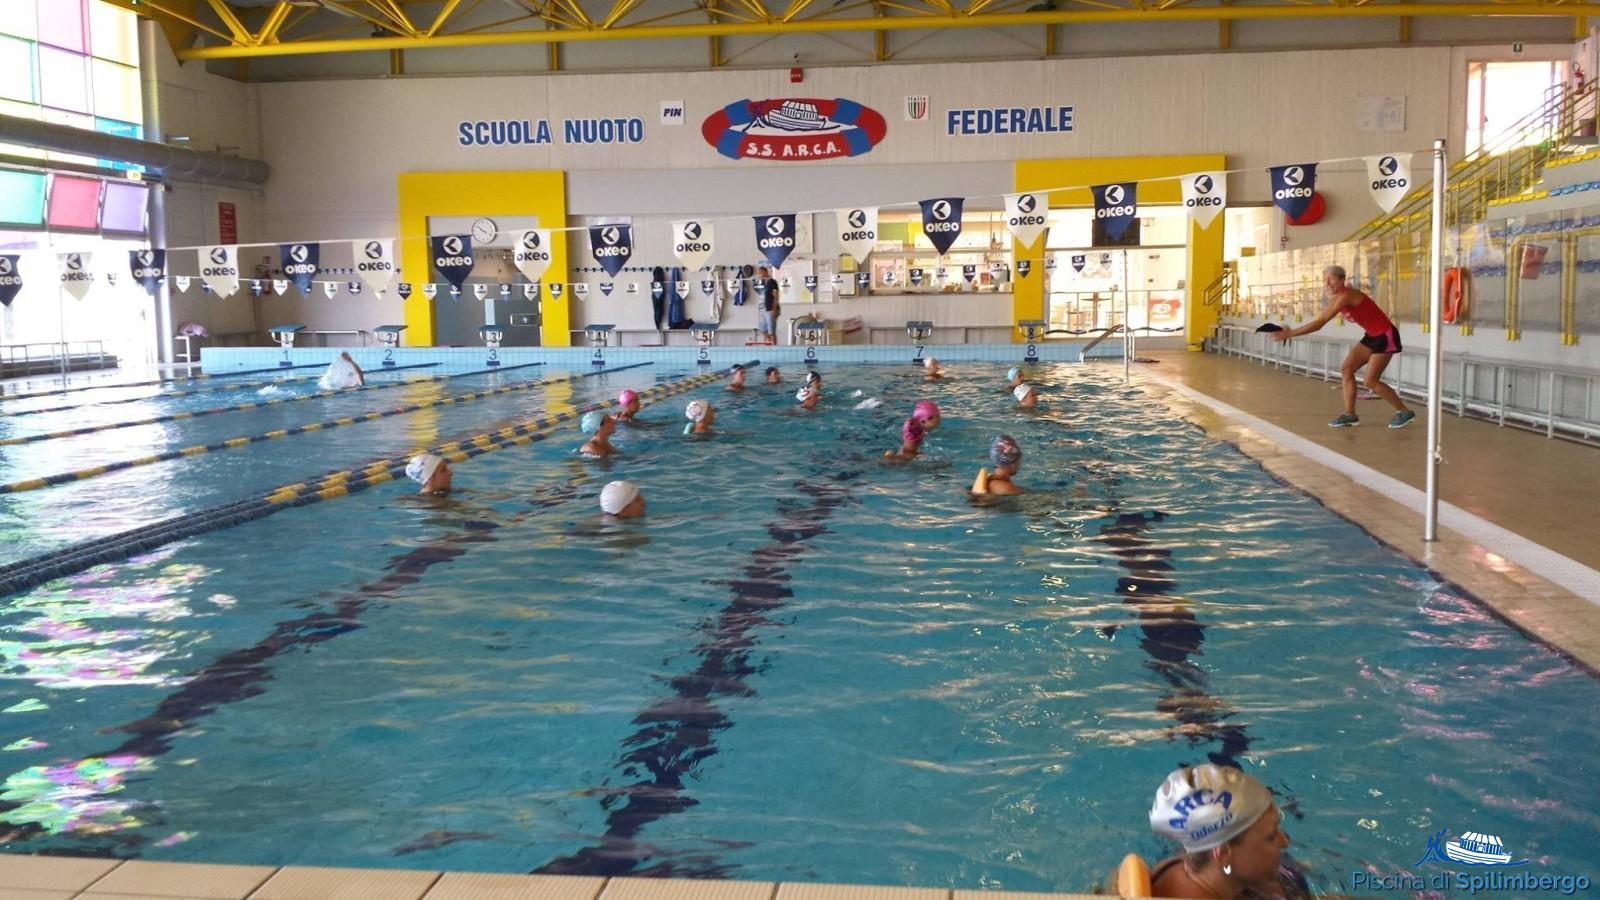 Vasca Da 25 Metri Tempi : Vasche ed impianto sportivo piscina di spilimbergo